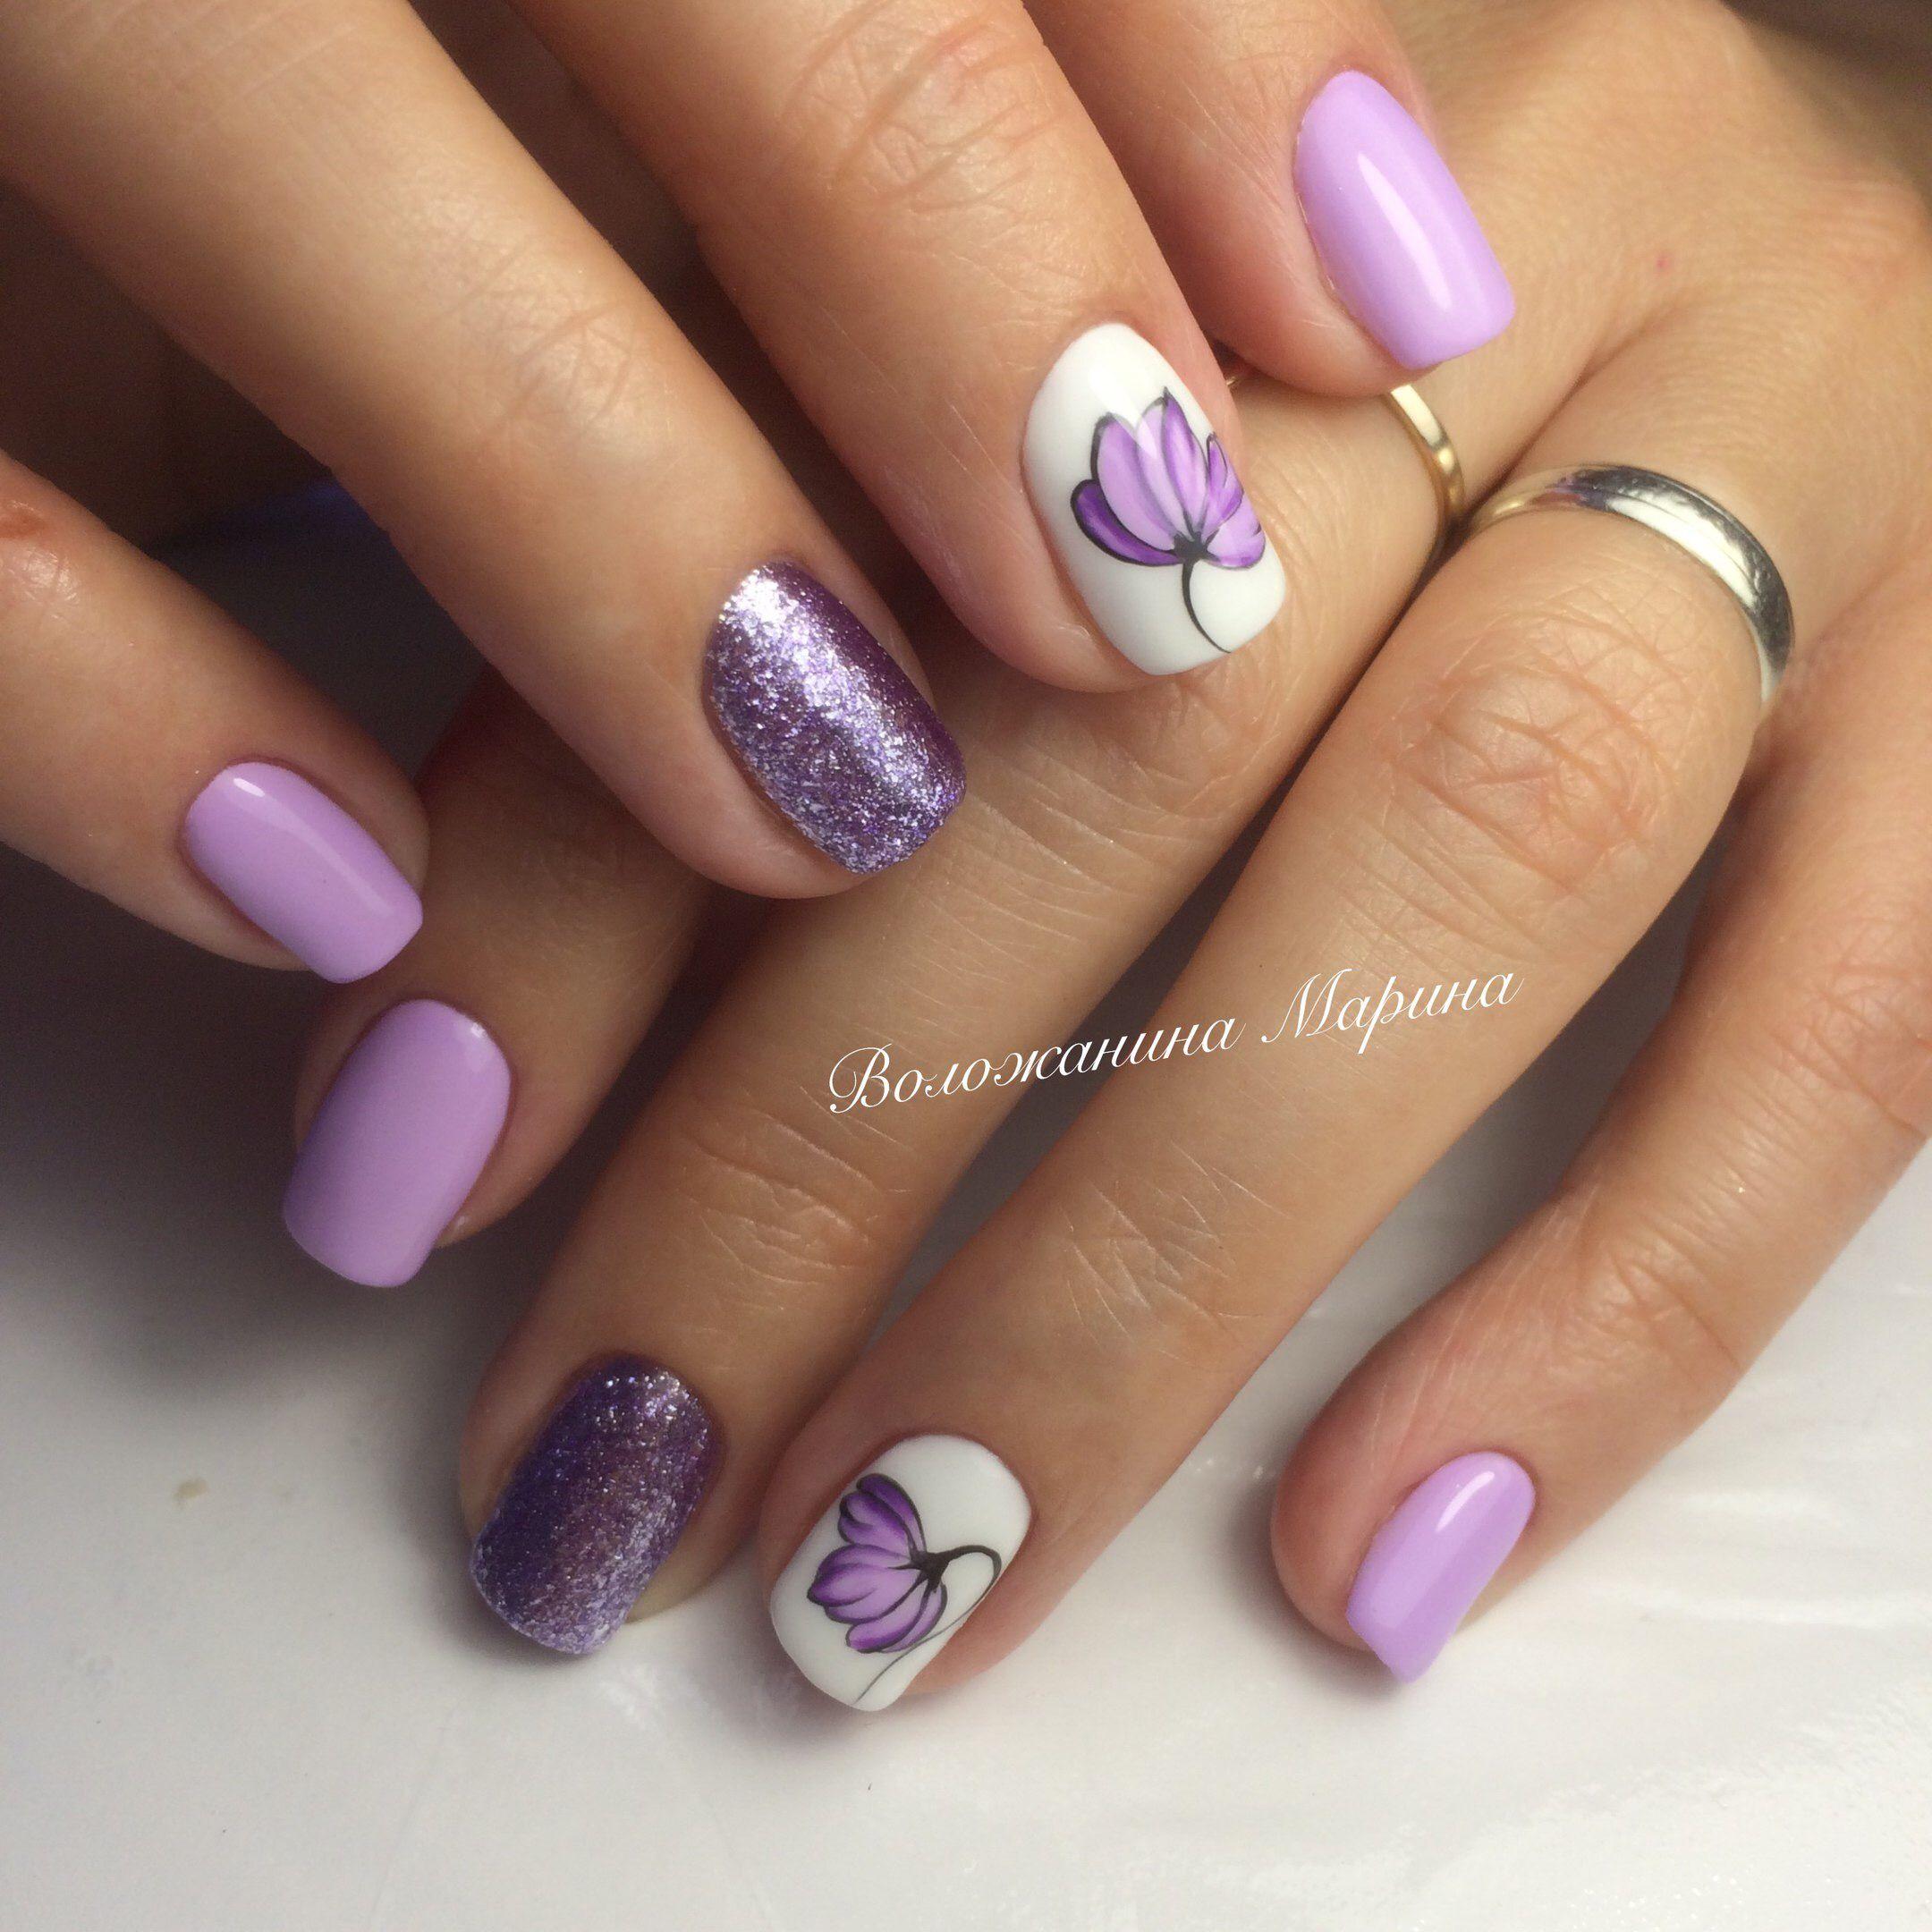 Pin by Tatiana on Ногти цветы, листья   Pinterest   Beauty nails